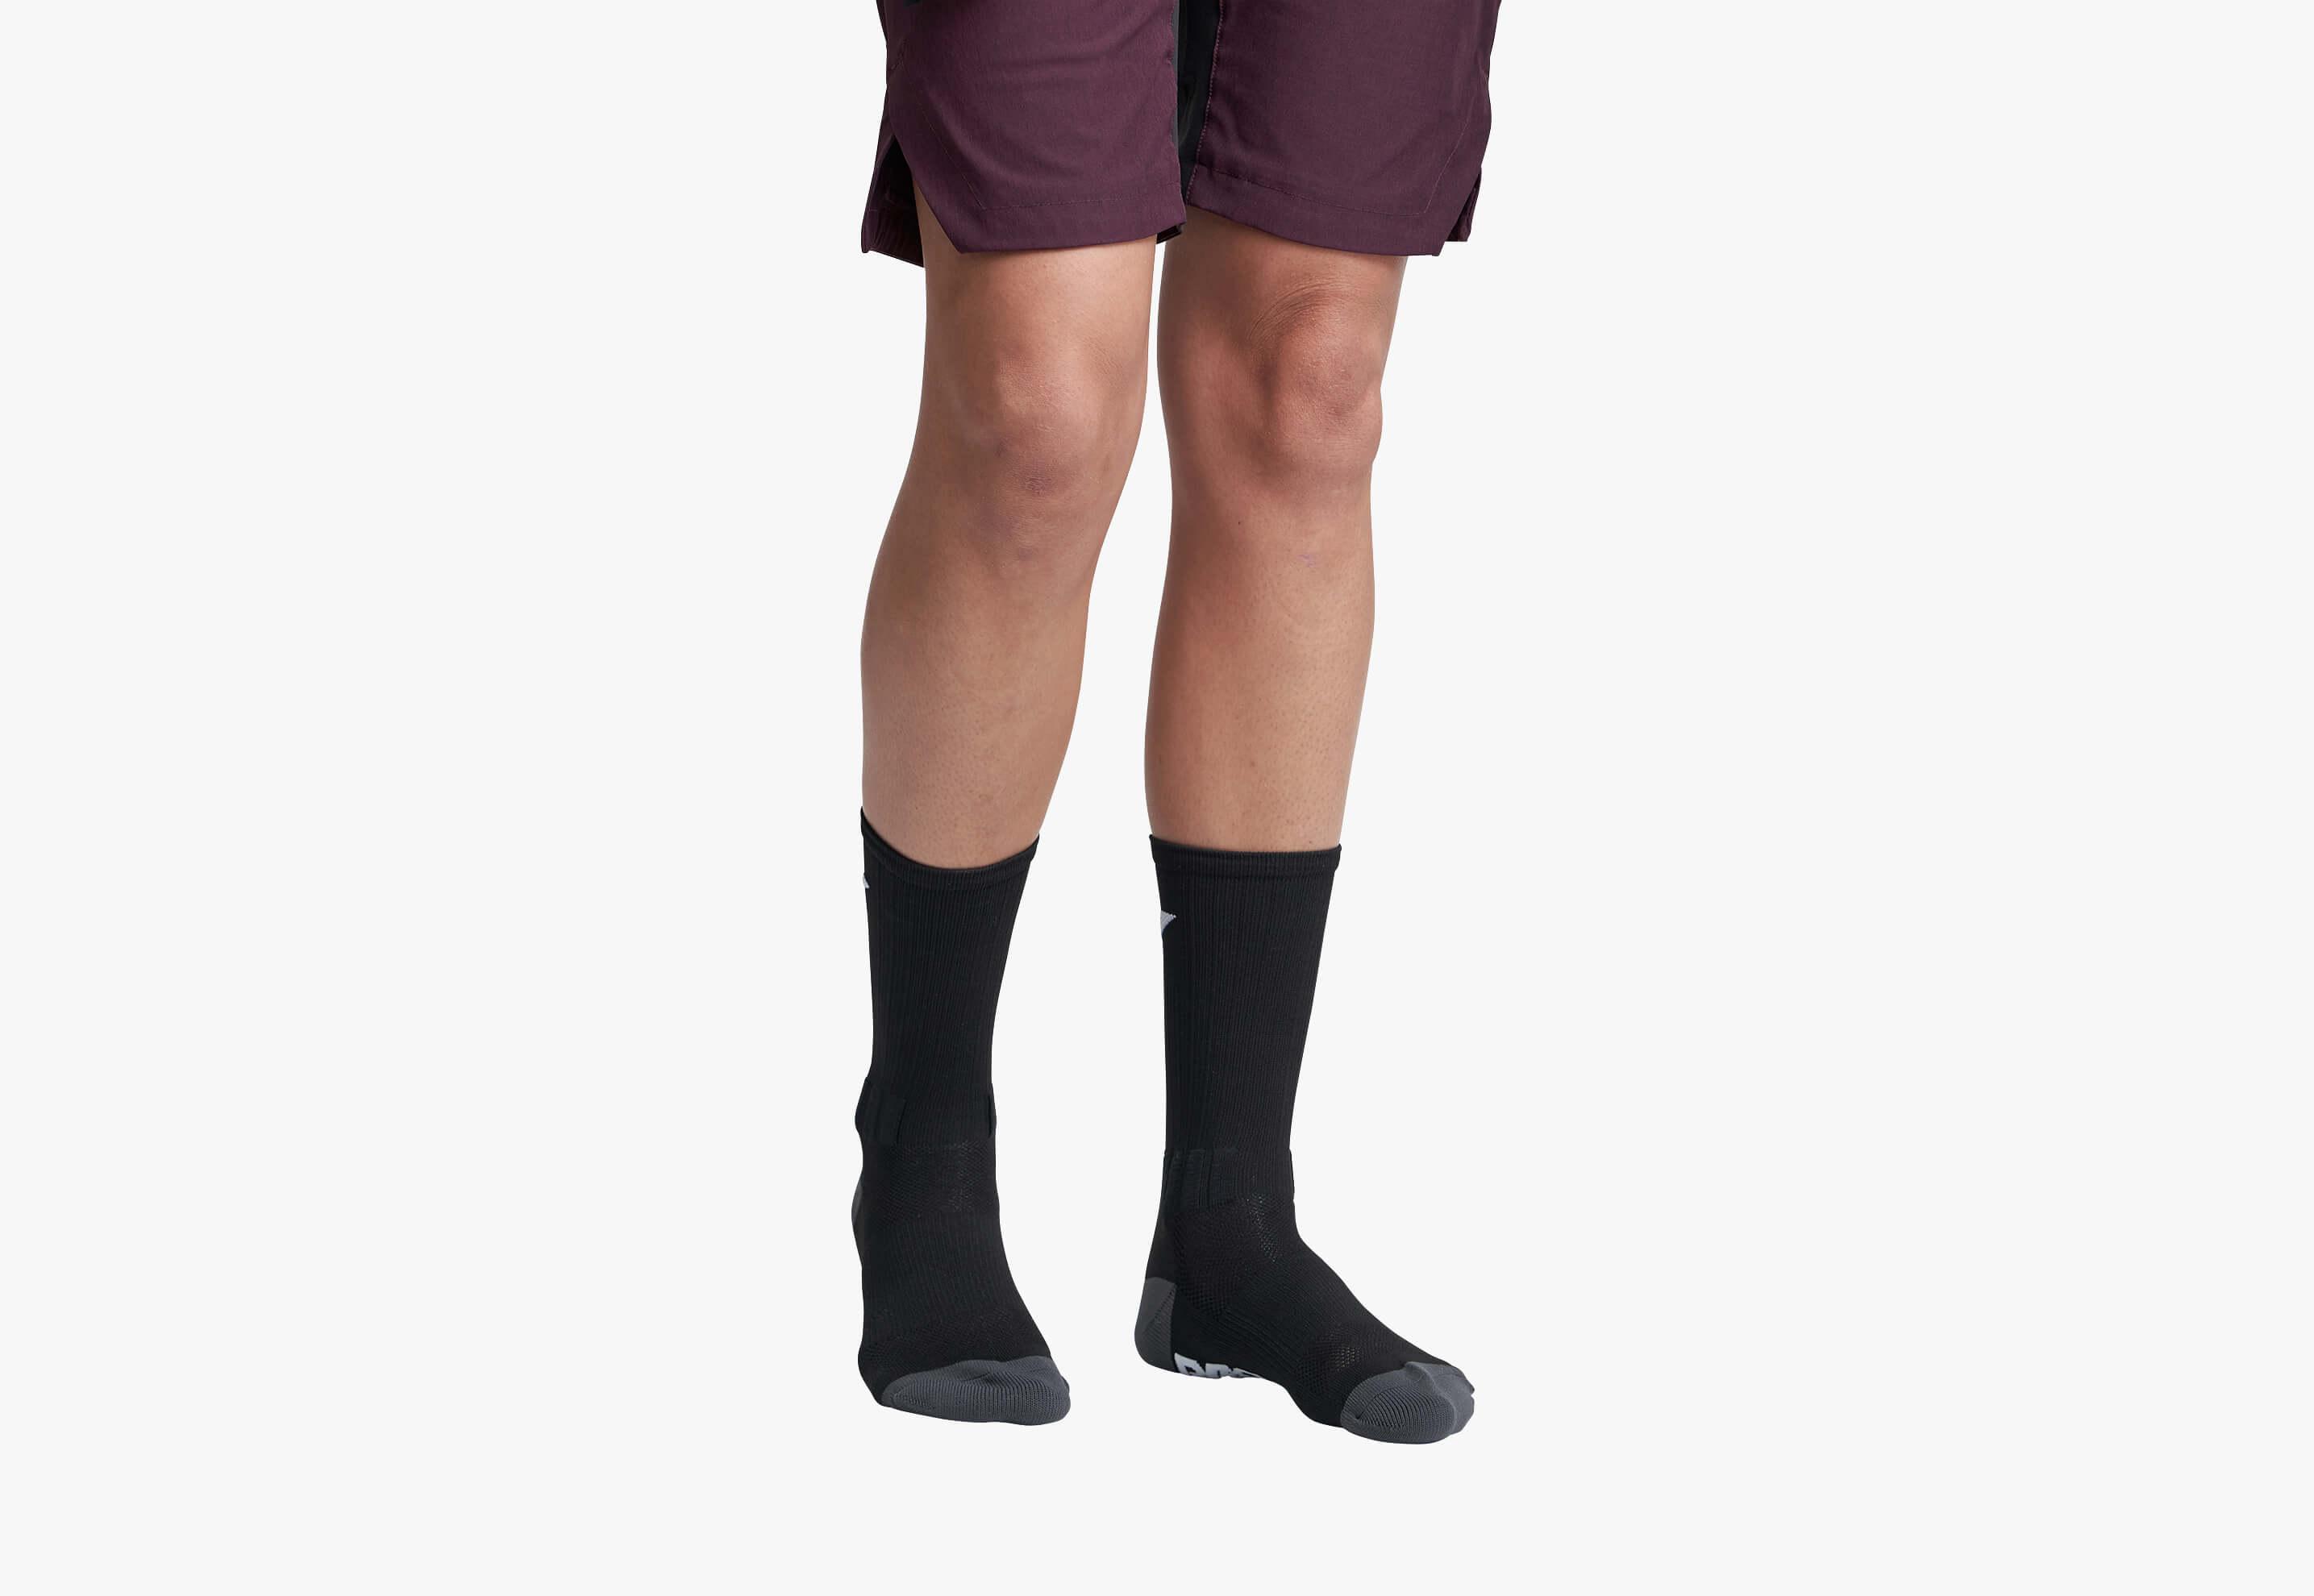 Indy Sock